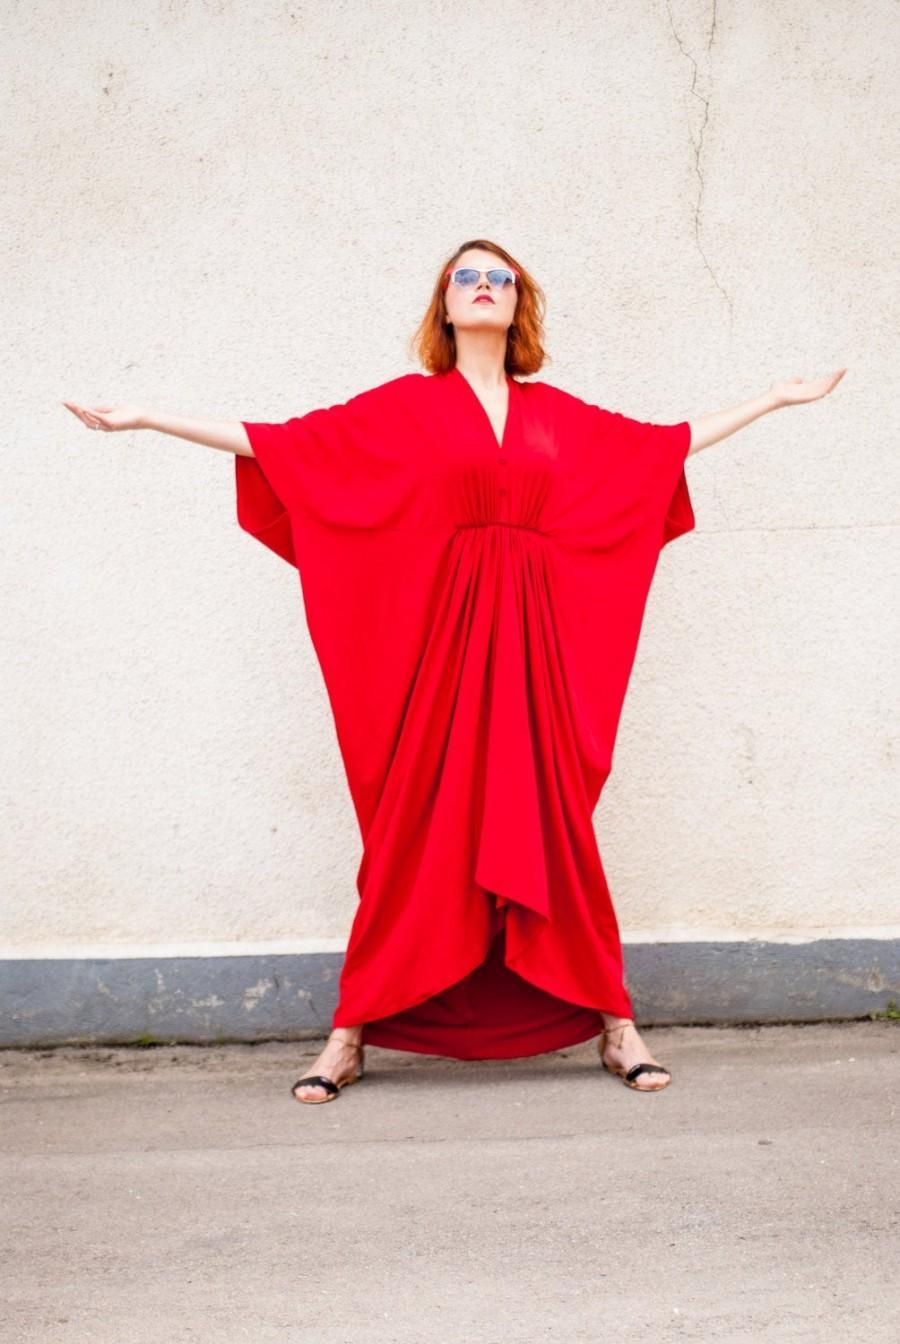 زفاف - Kimono Summer Dress Women Maxi Wrap Dress Plus Size Work Dress TDK26 Evening Gown Maternity Breastfeed Dress for 3XL Formal Long Dress